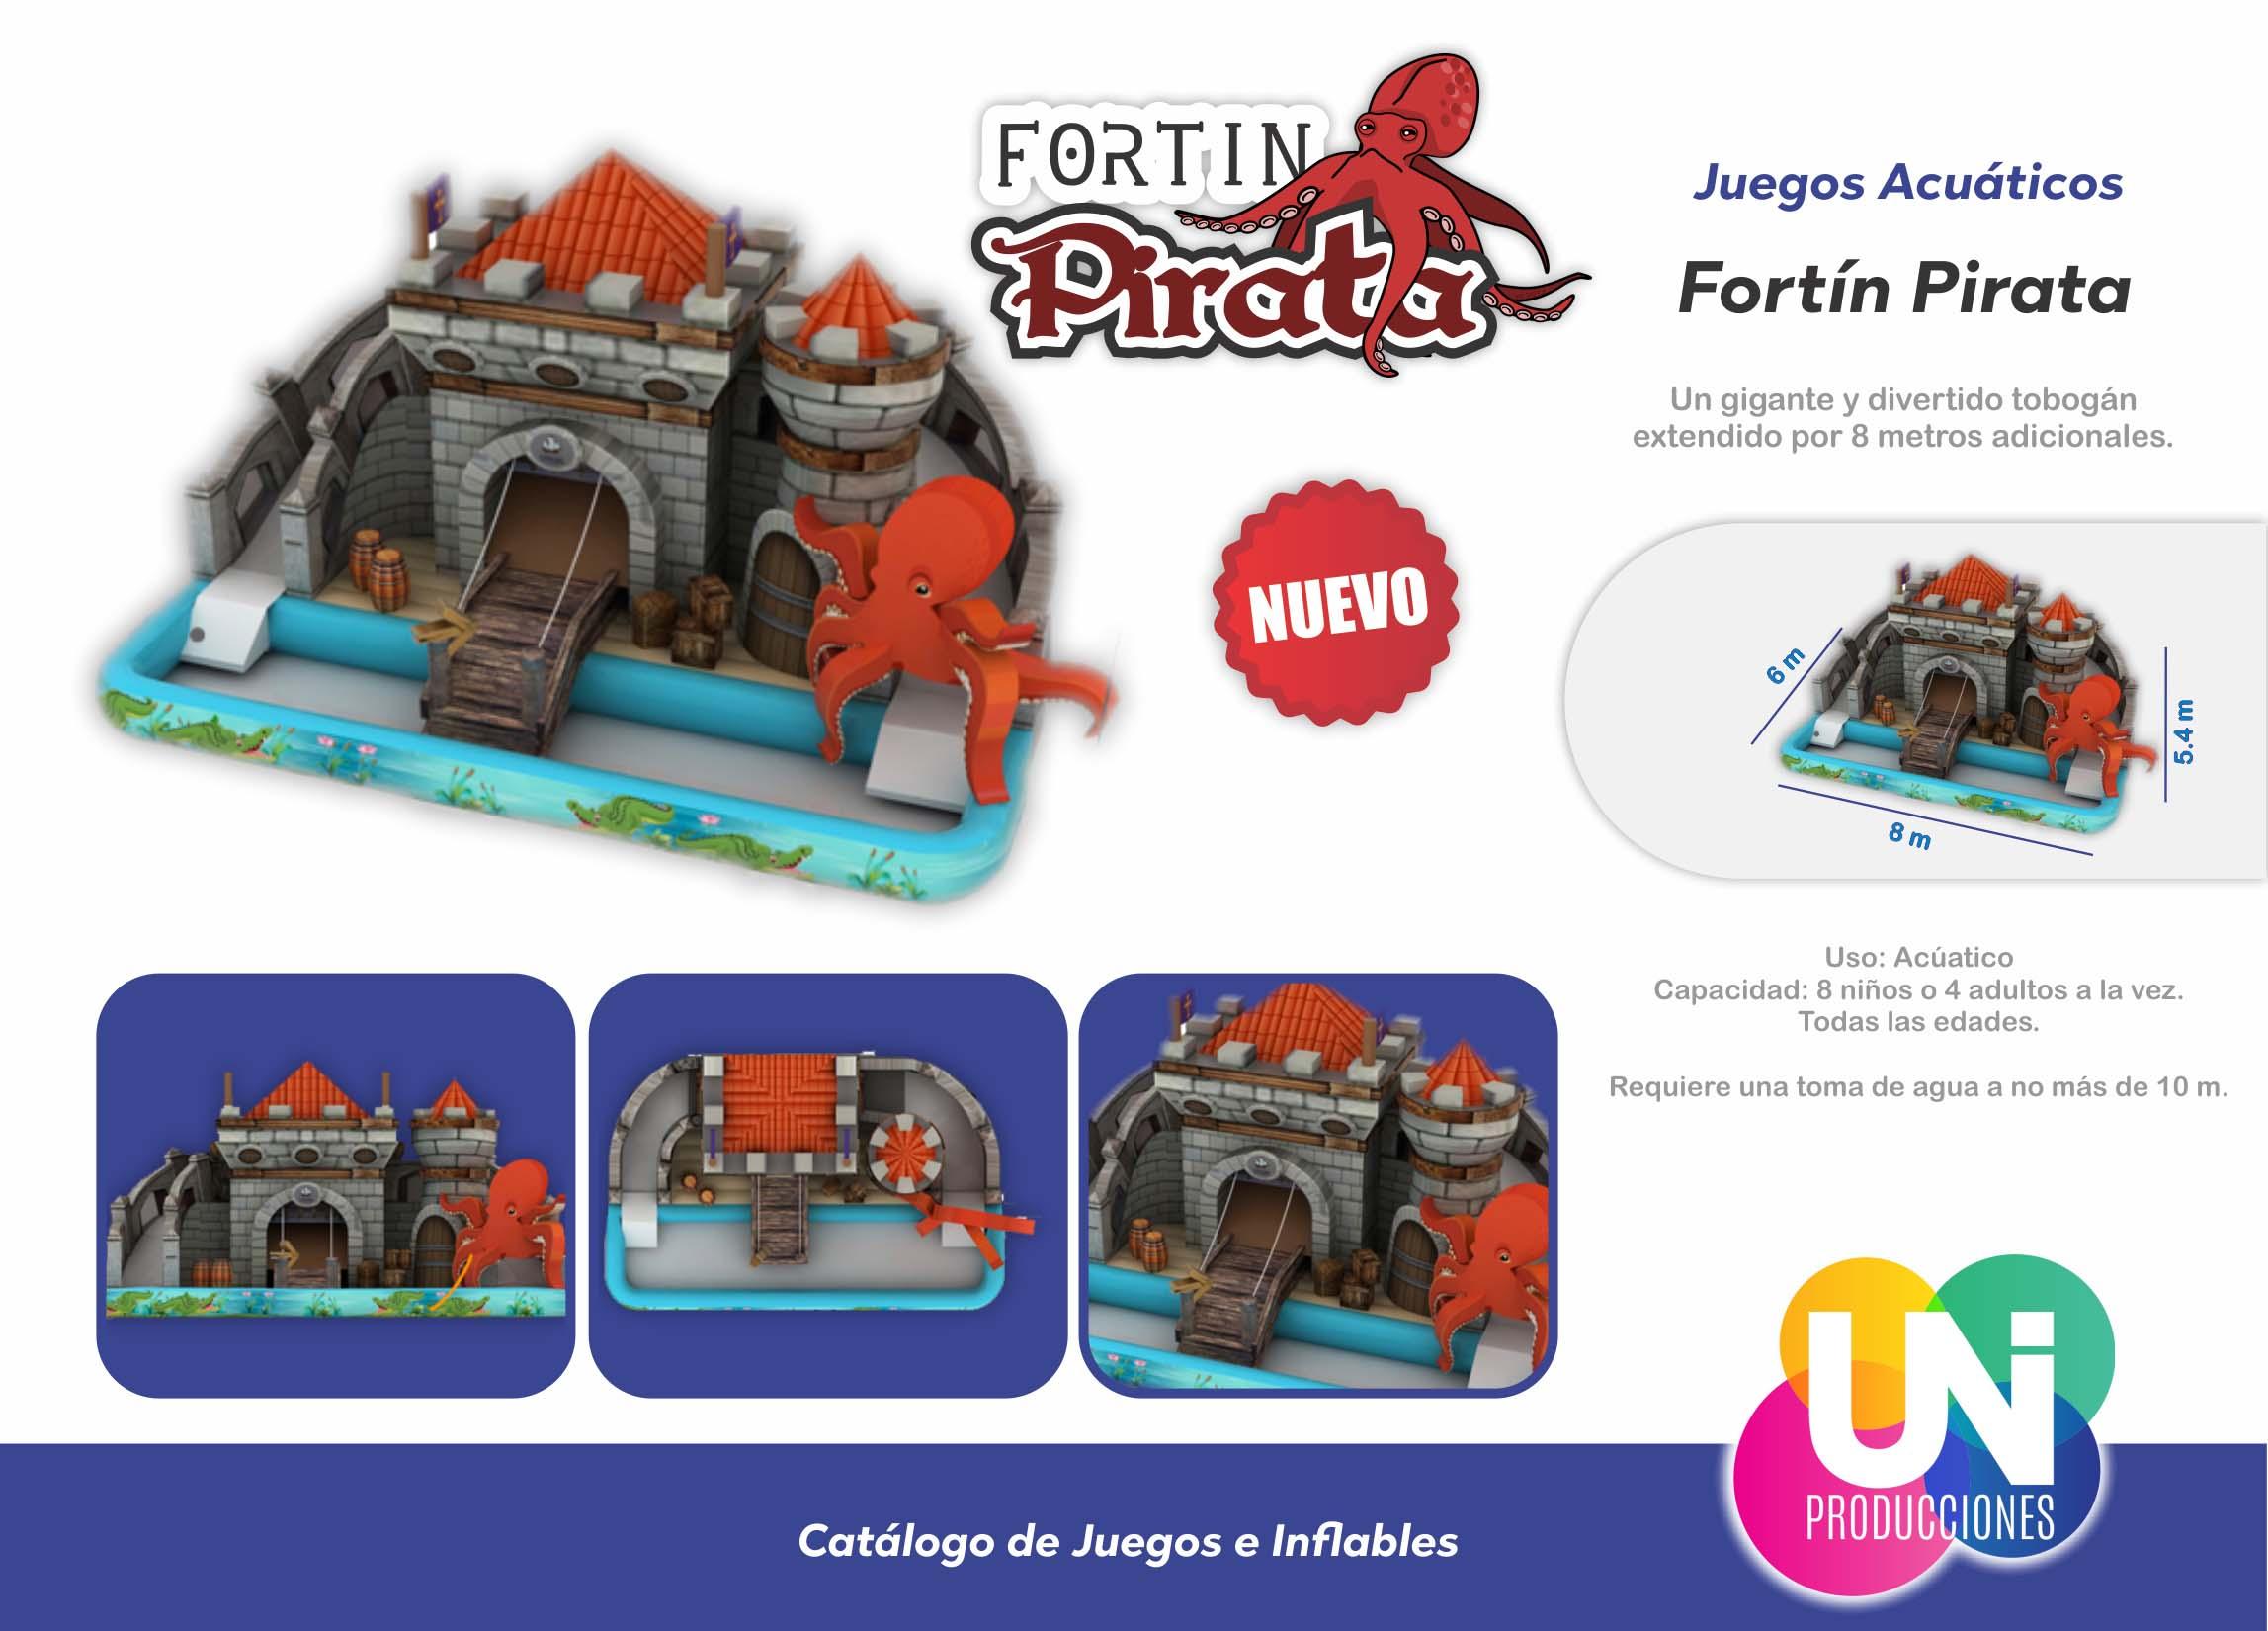 Fortin Pirata